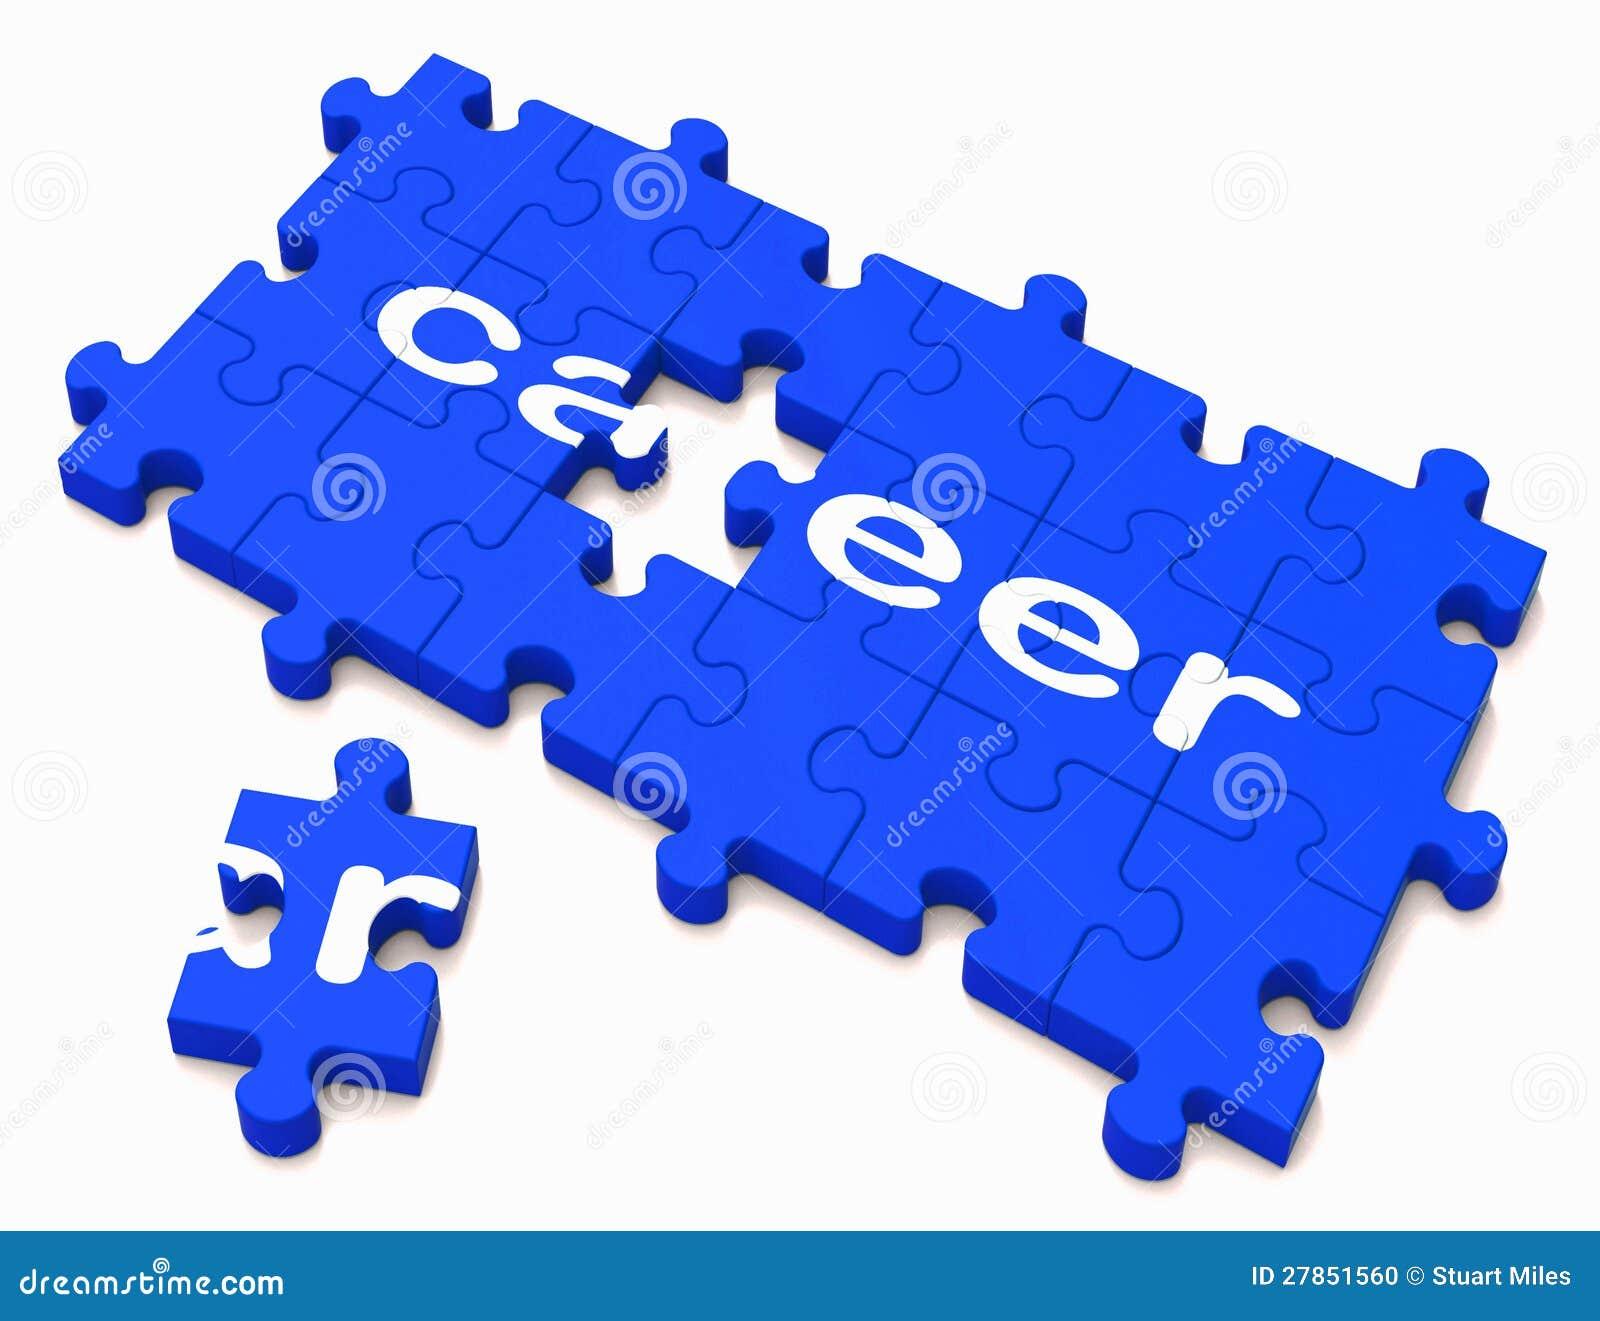 Kariera znak Pokazuje Pomyślnych studia